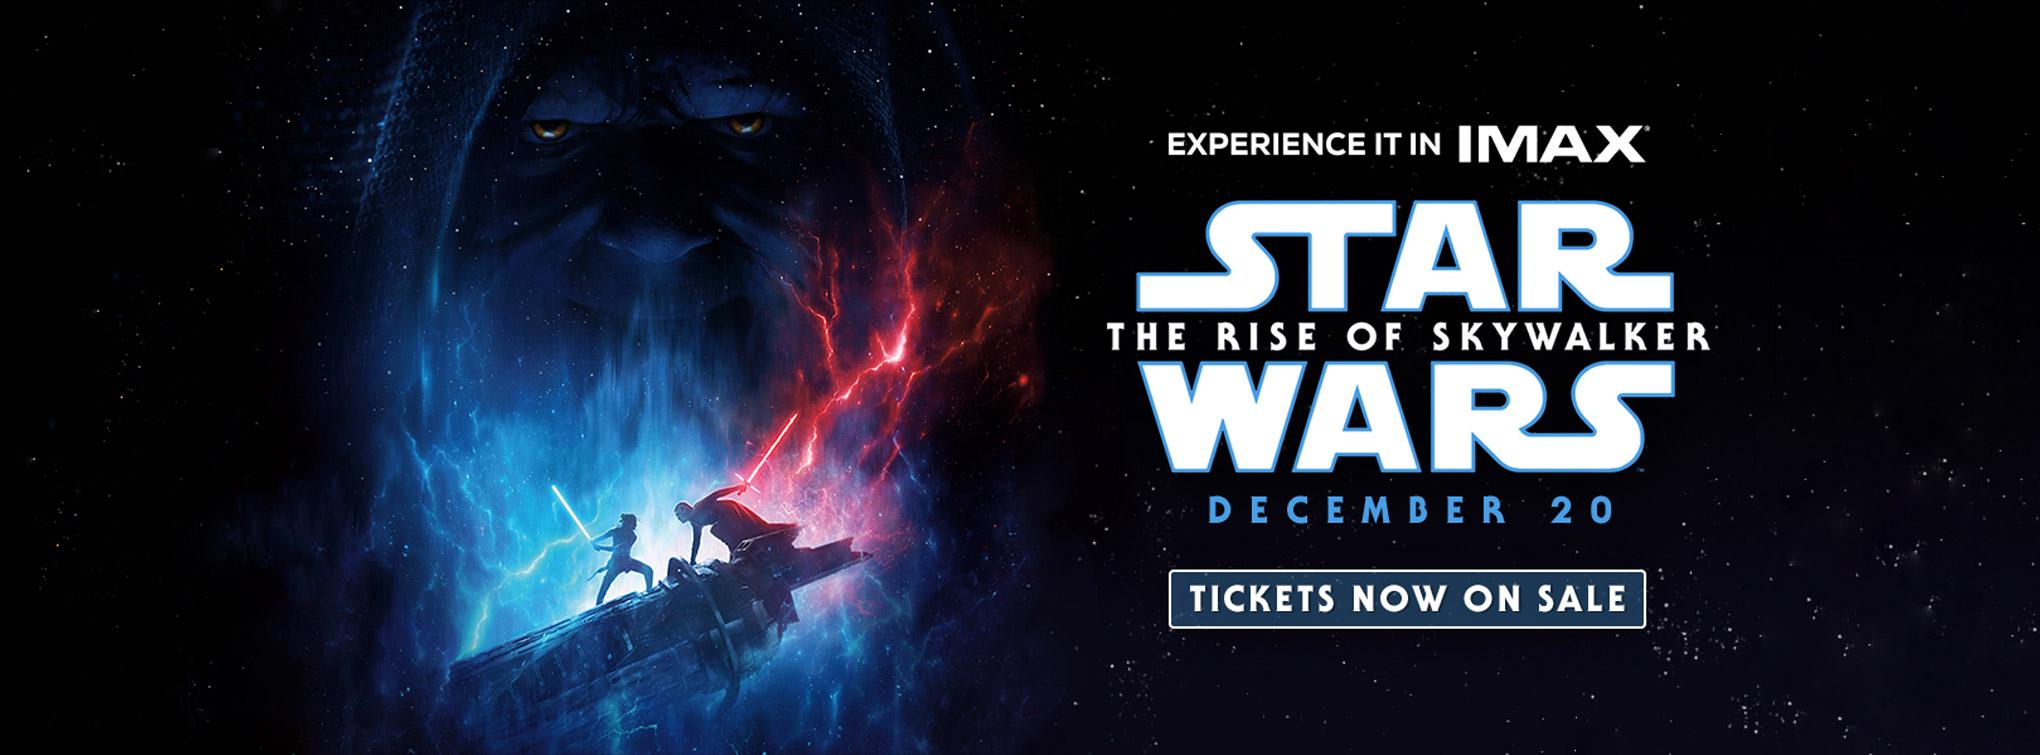 Slider image for Star Wars: The Rise of Skywalker - tickets on sale now!